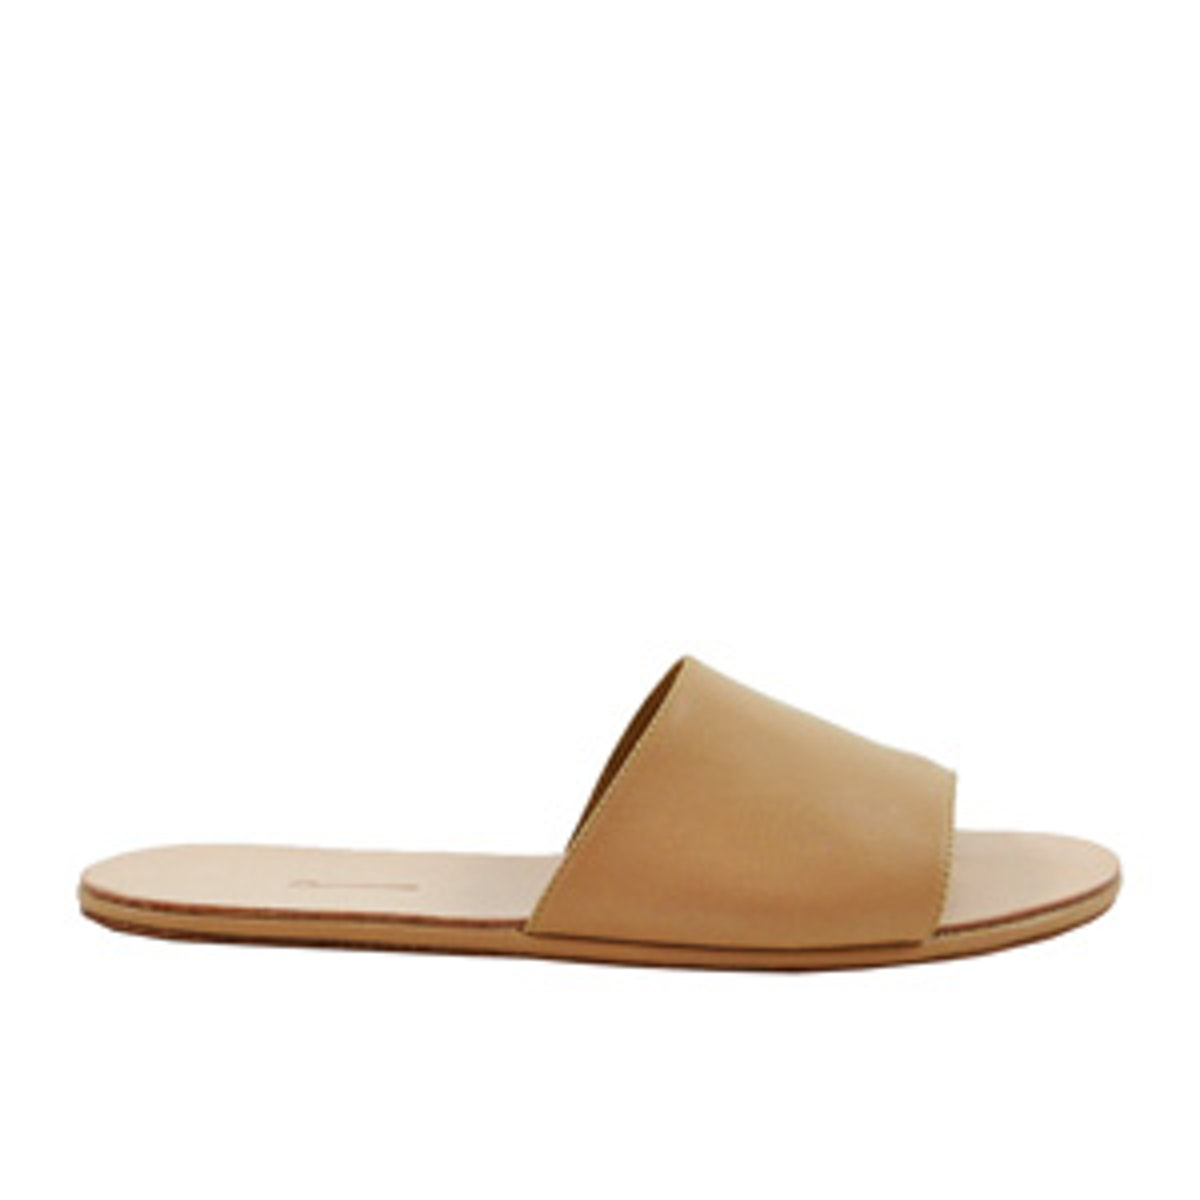 Caelum Slide Sandal